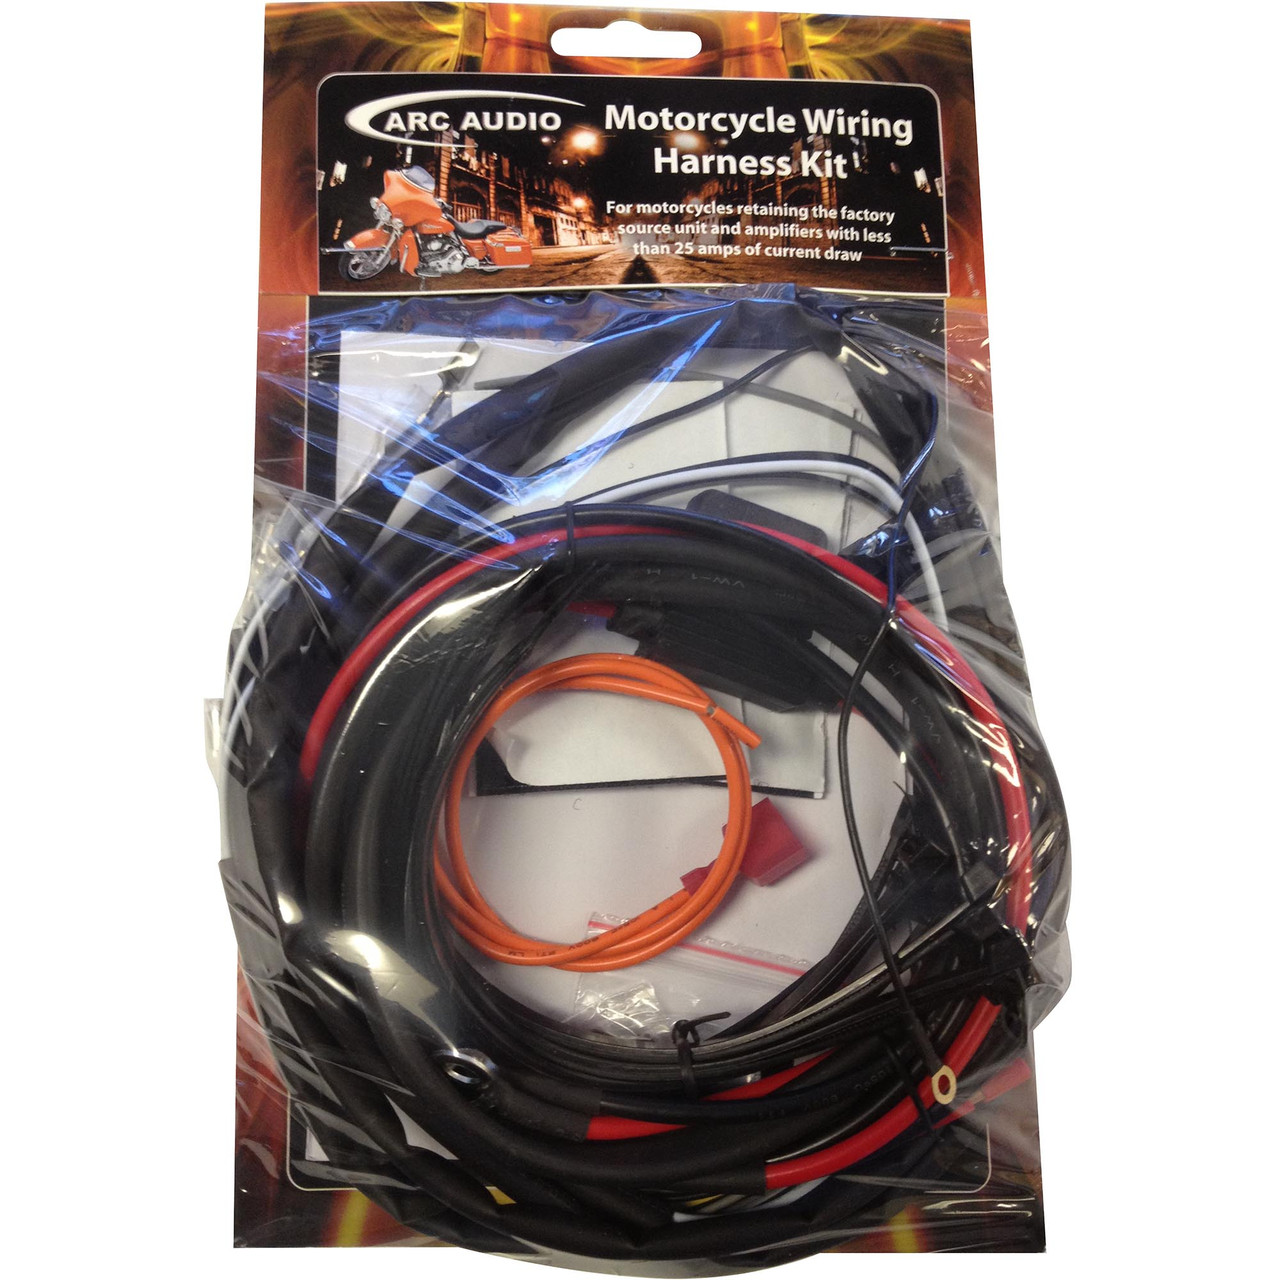 arc wiring harness wiring diagram datasource on air lift wiring diagram pro comp wiring  [ 874 x 1280 Pixel ]